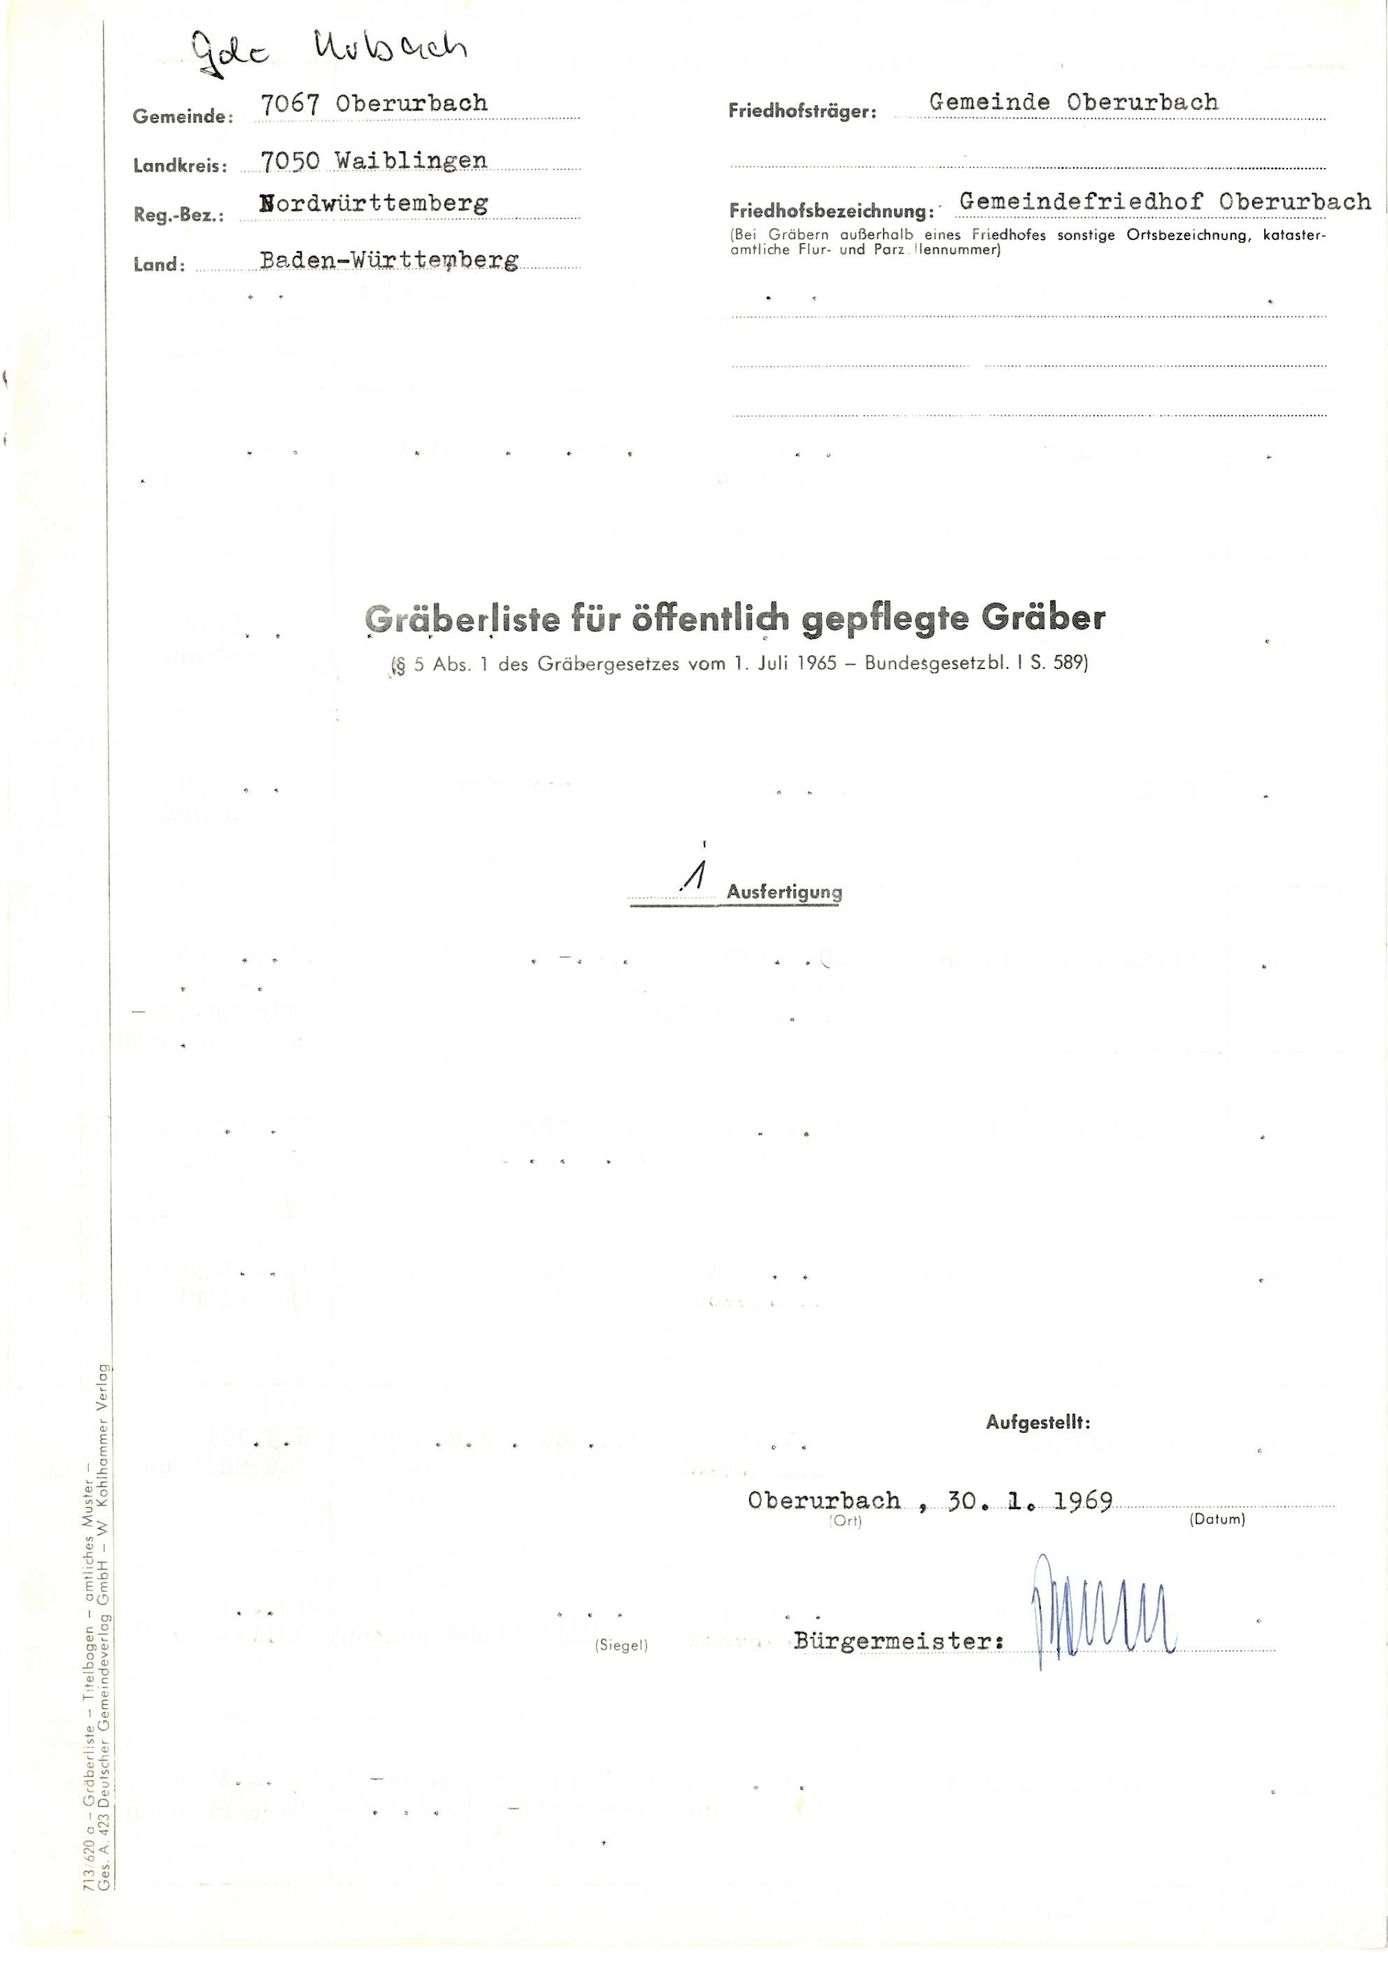 Oberurbach, Bild 1